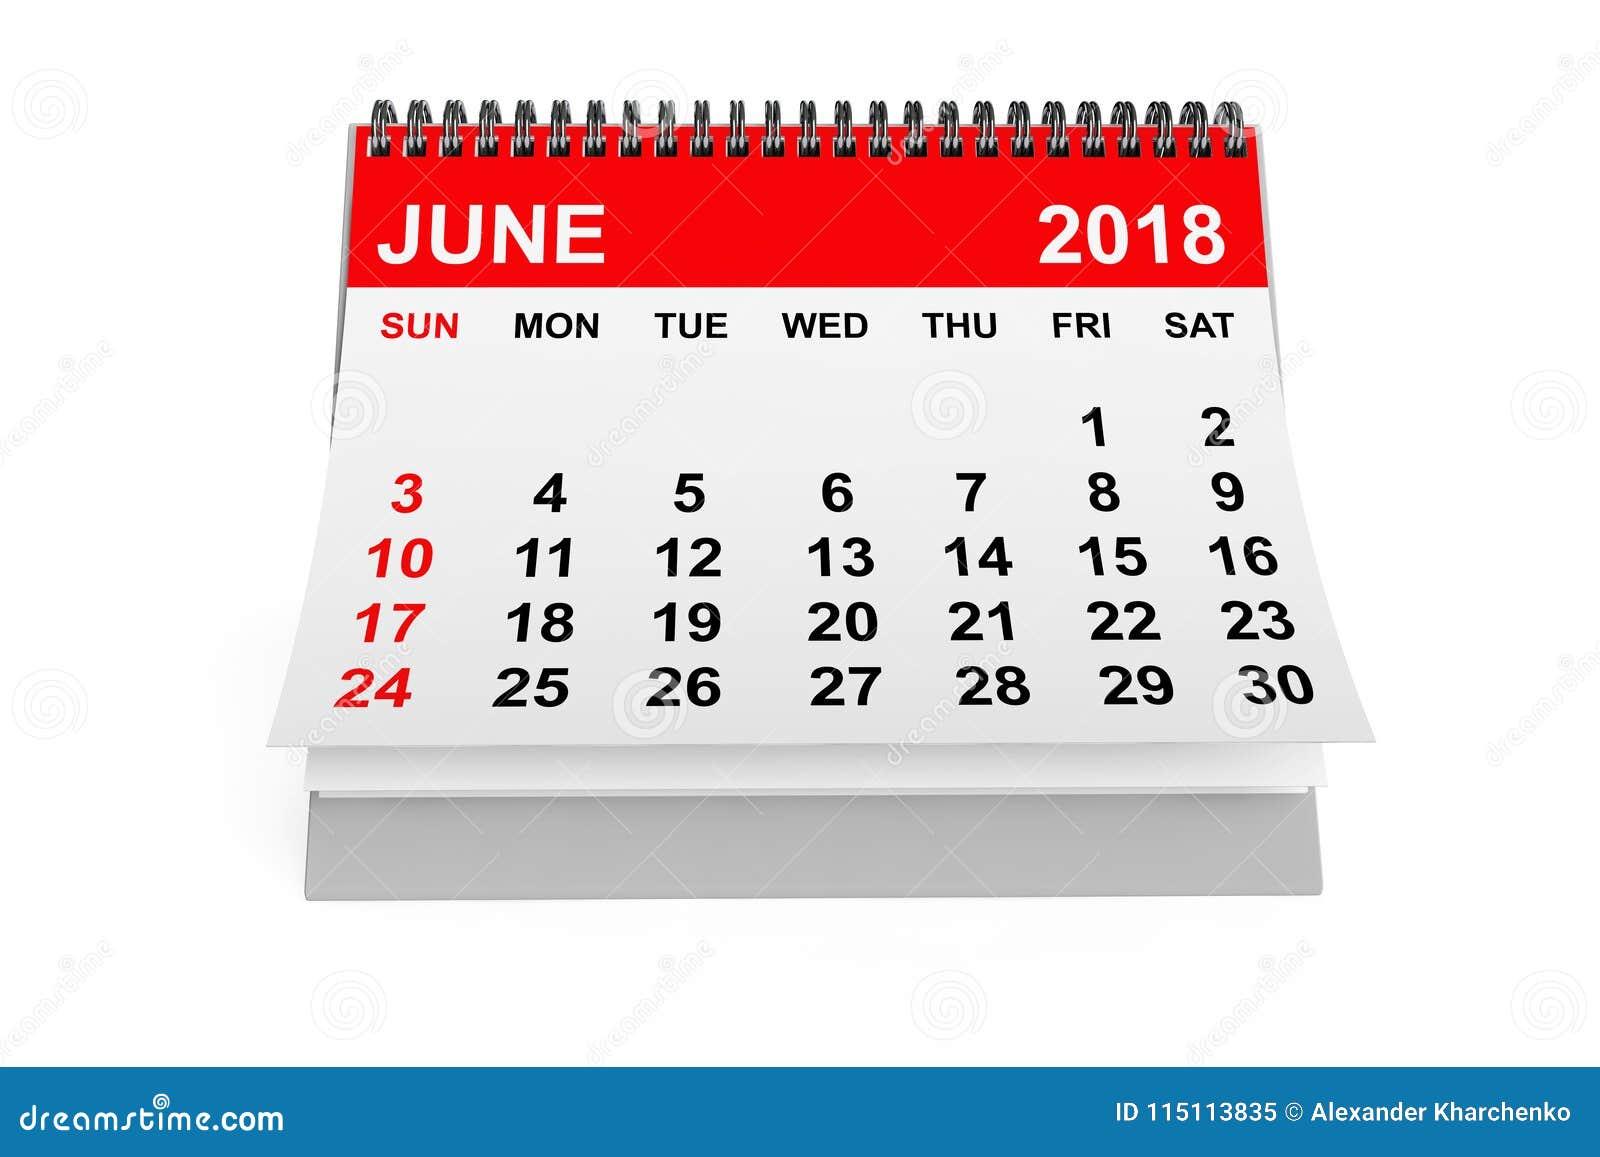 Calendar Illustration List : Calendar june d rendering stock illustration